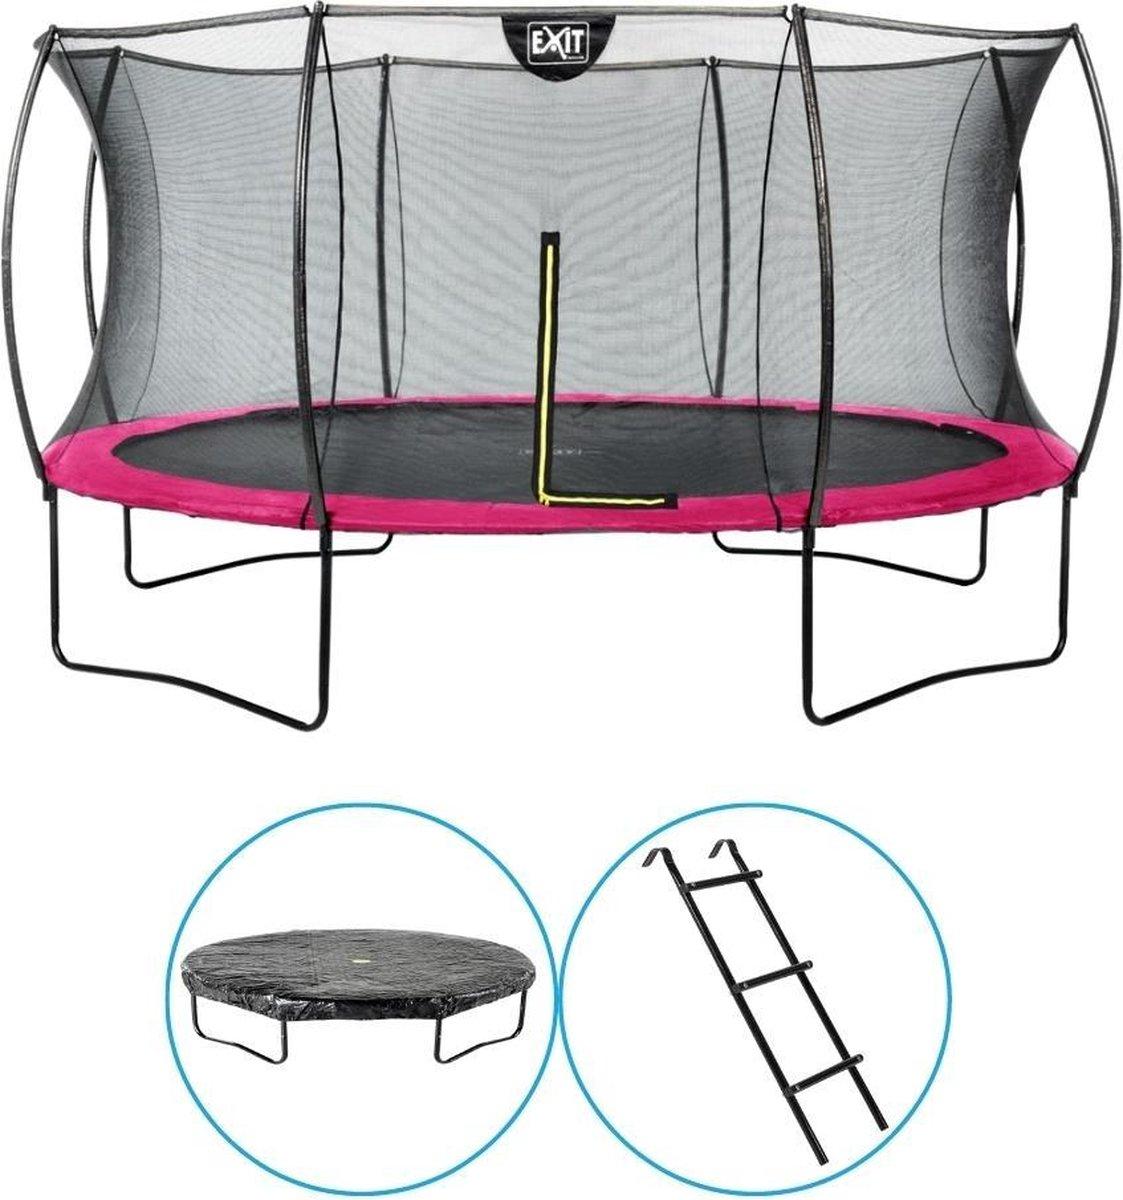 EXIT Toys - Trampoline Met Veiligheidsnet - Op Poten - Silhouette - Rond - ø427cm - Roze - Inclusief Ladder en Afdekhoes